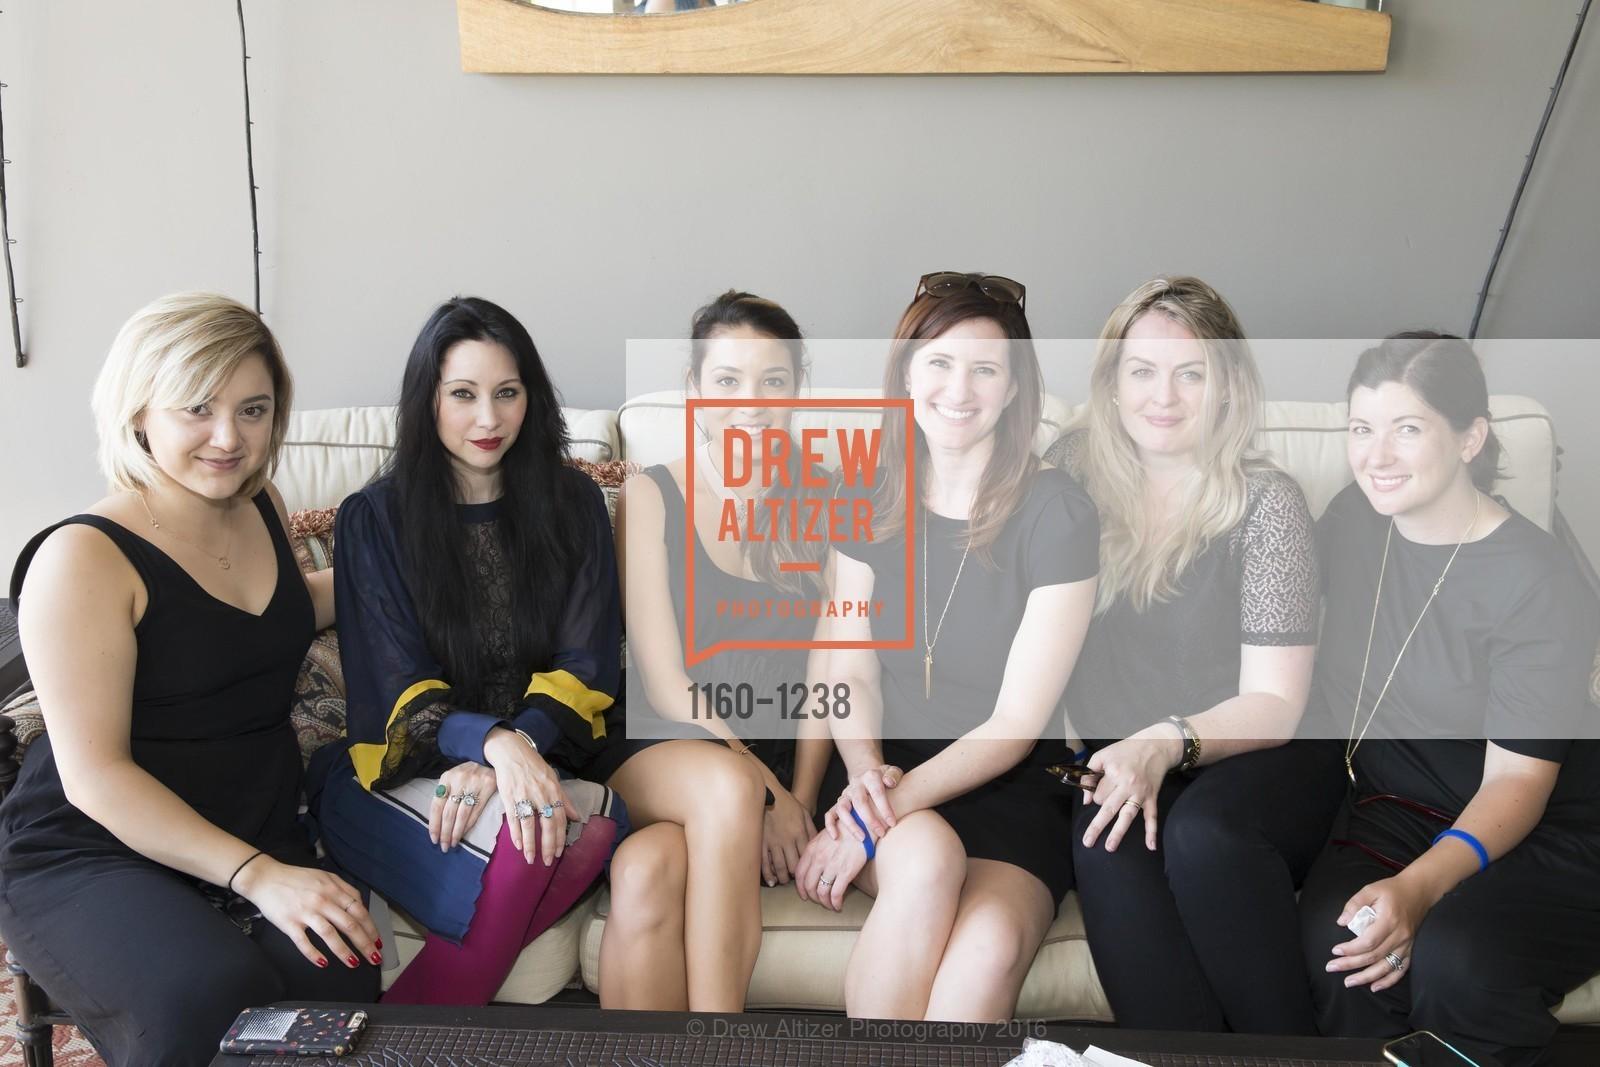 Irma Serrano, Cati Gallardo, Kiana Cuhn, Sarah Roach Henry, Rowena Ritchie, Simone Tracy, Photo #1160-1238